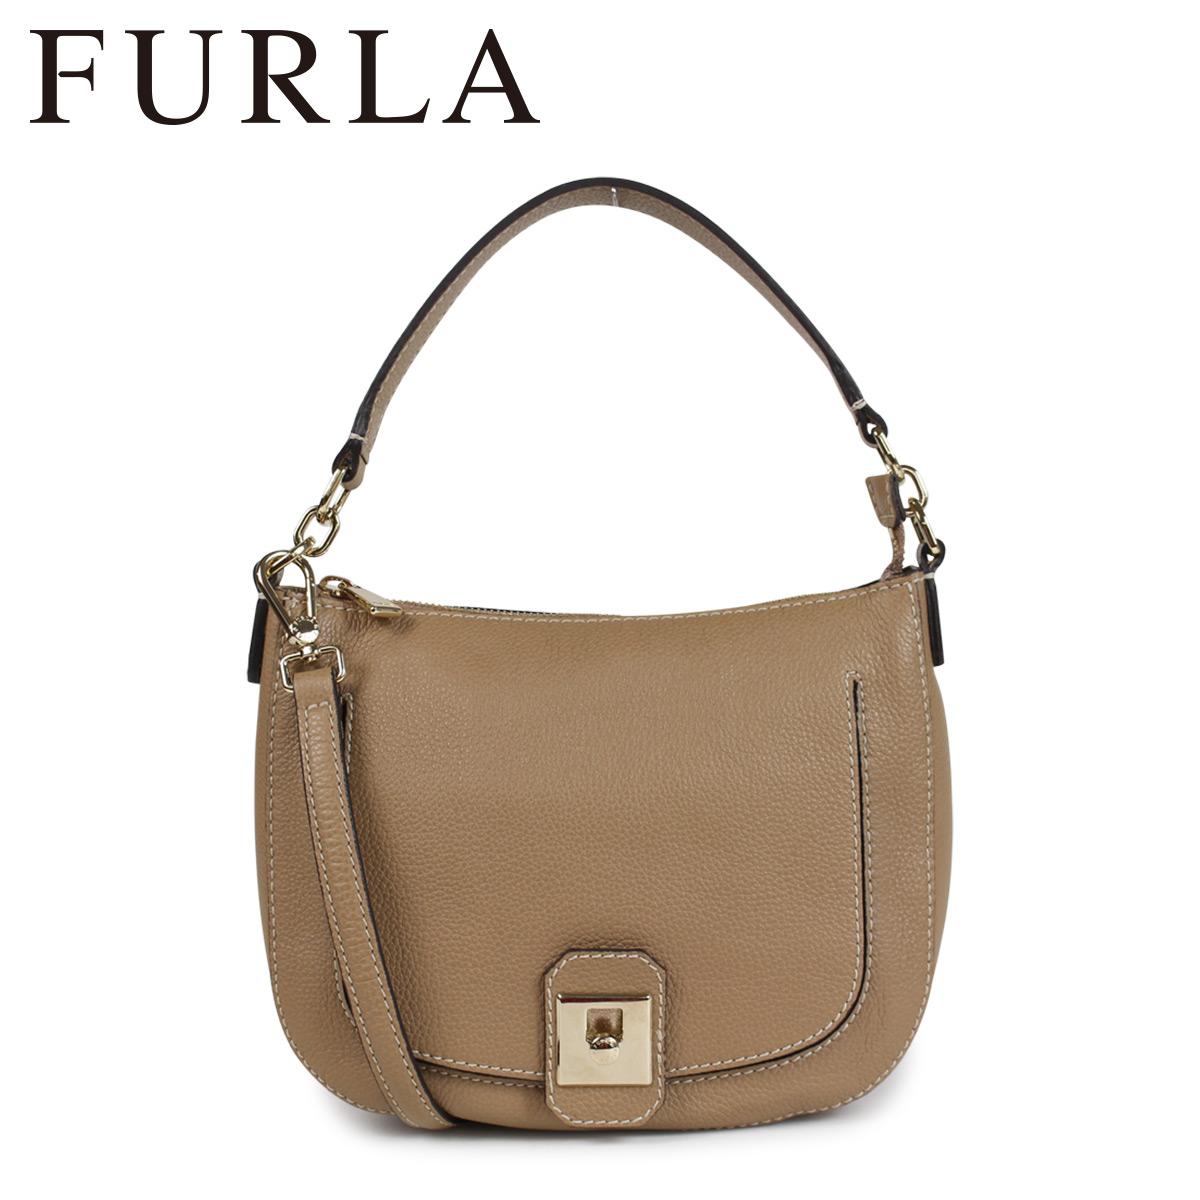 FURLA フルラ バッグ ショルダーバッグ レディース JO MINI SHOULDER BAG キャメル 864076